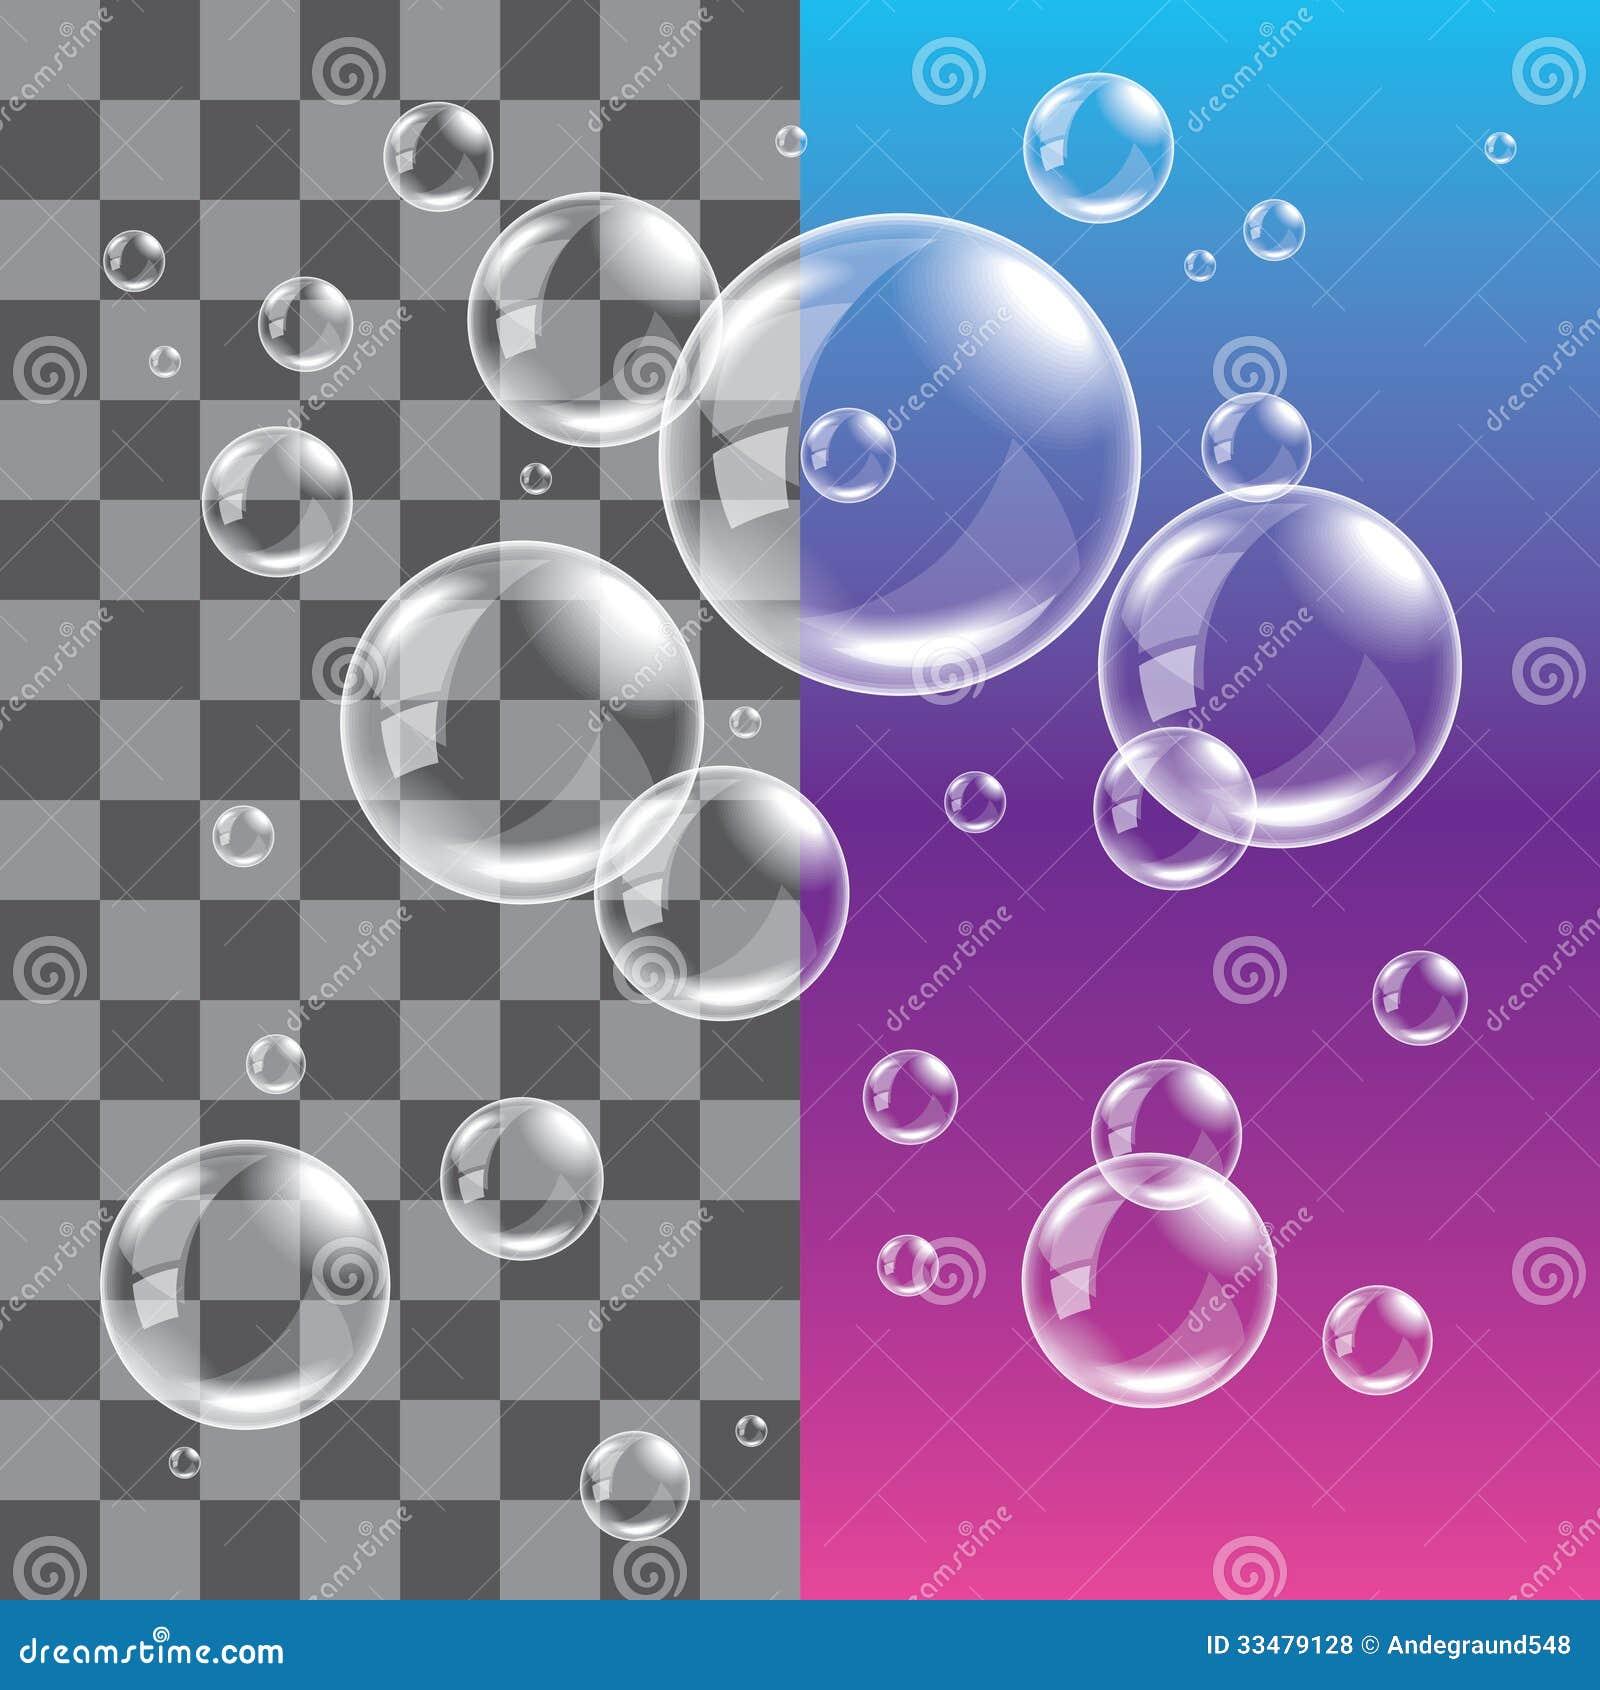 Animated Soap Bubbles